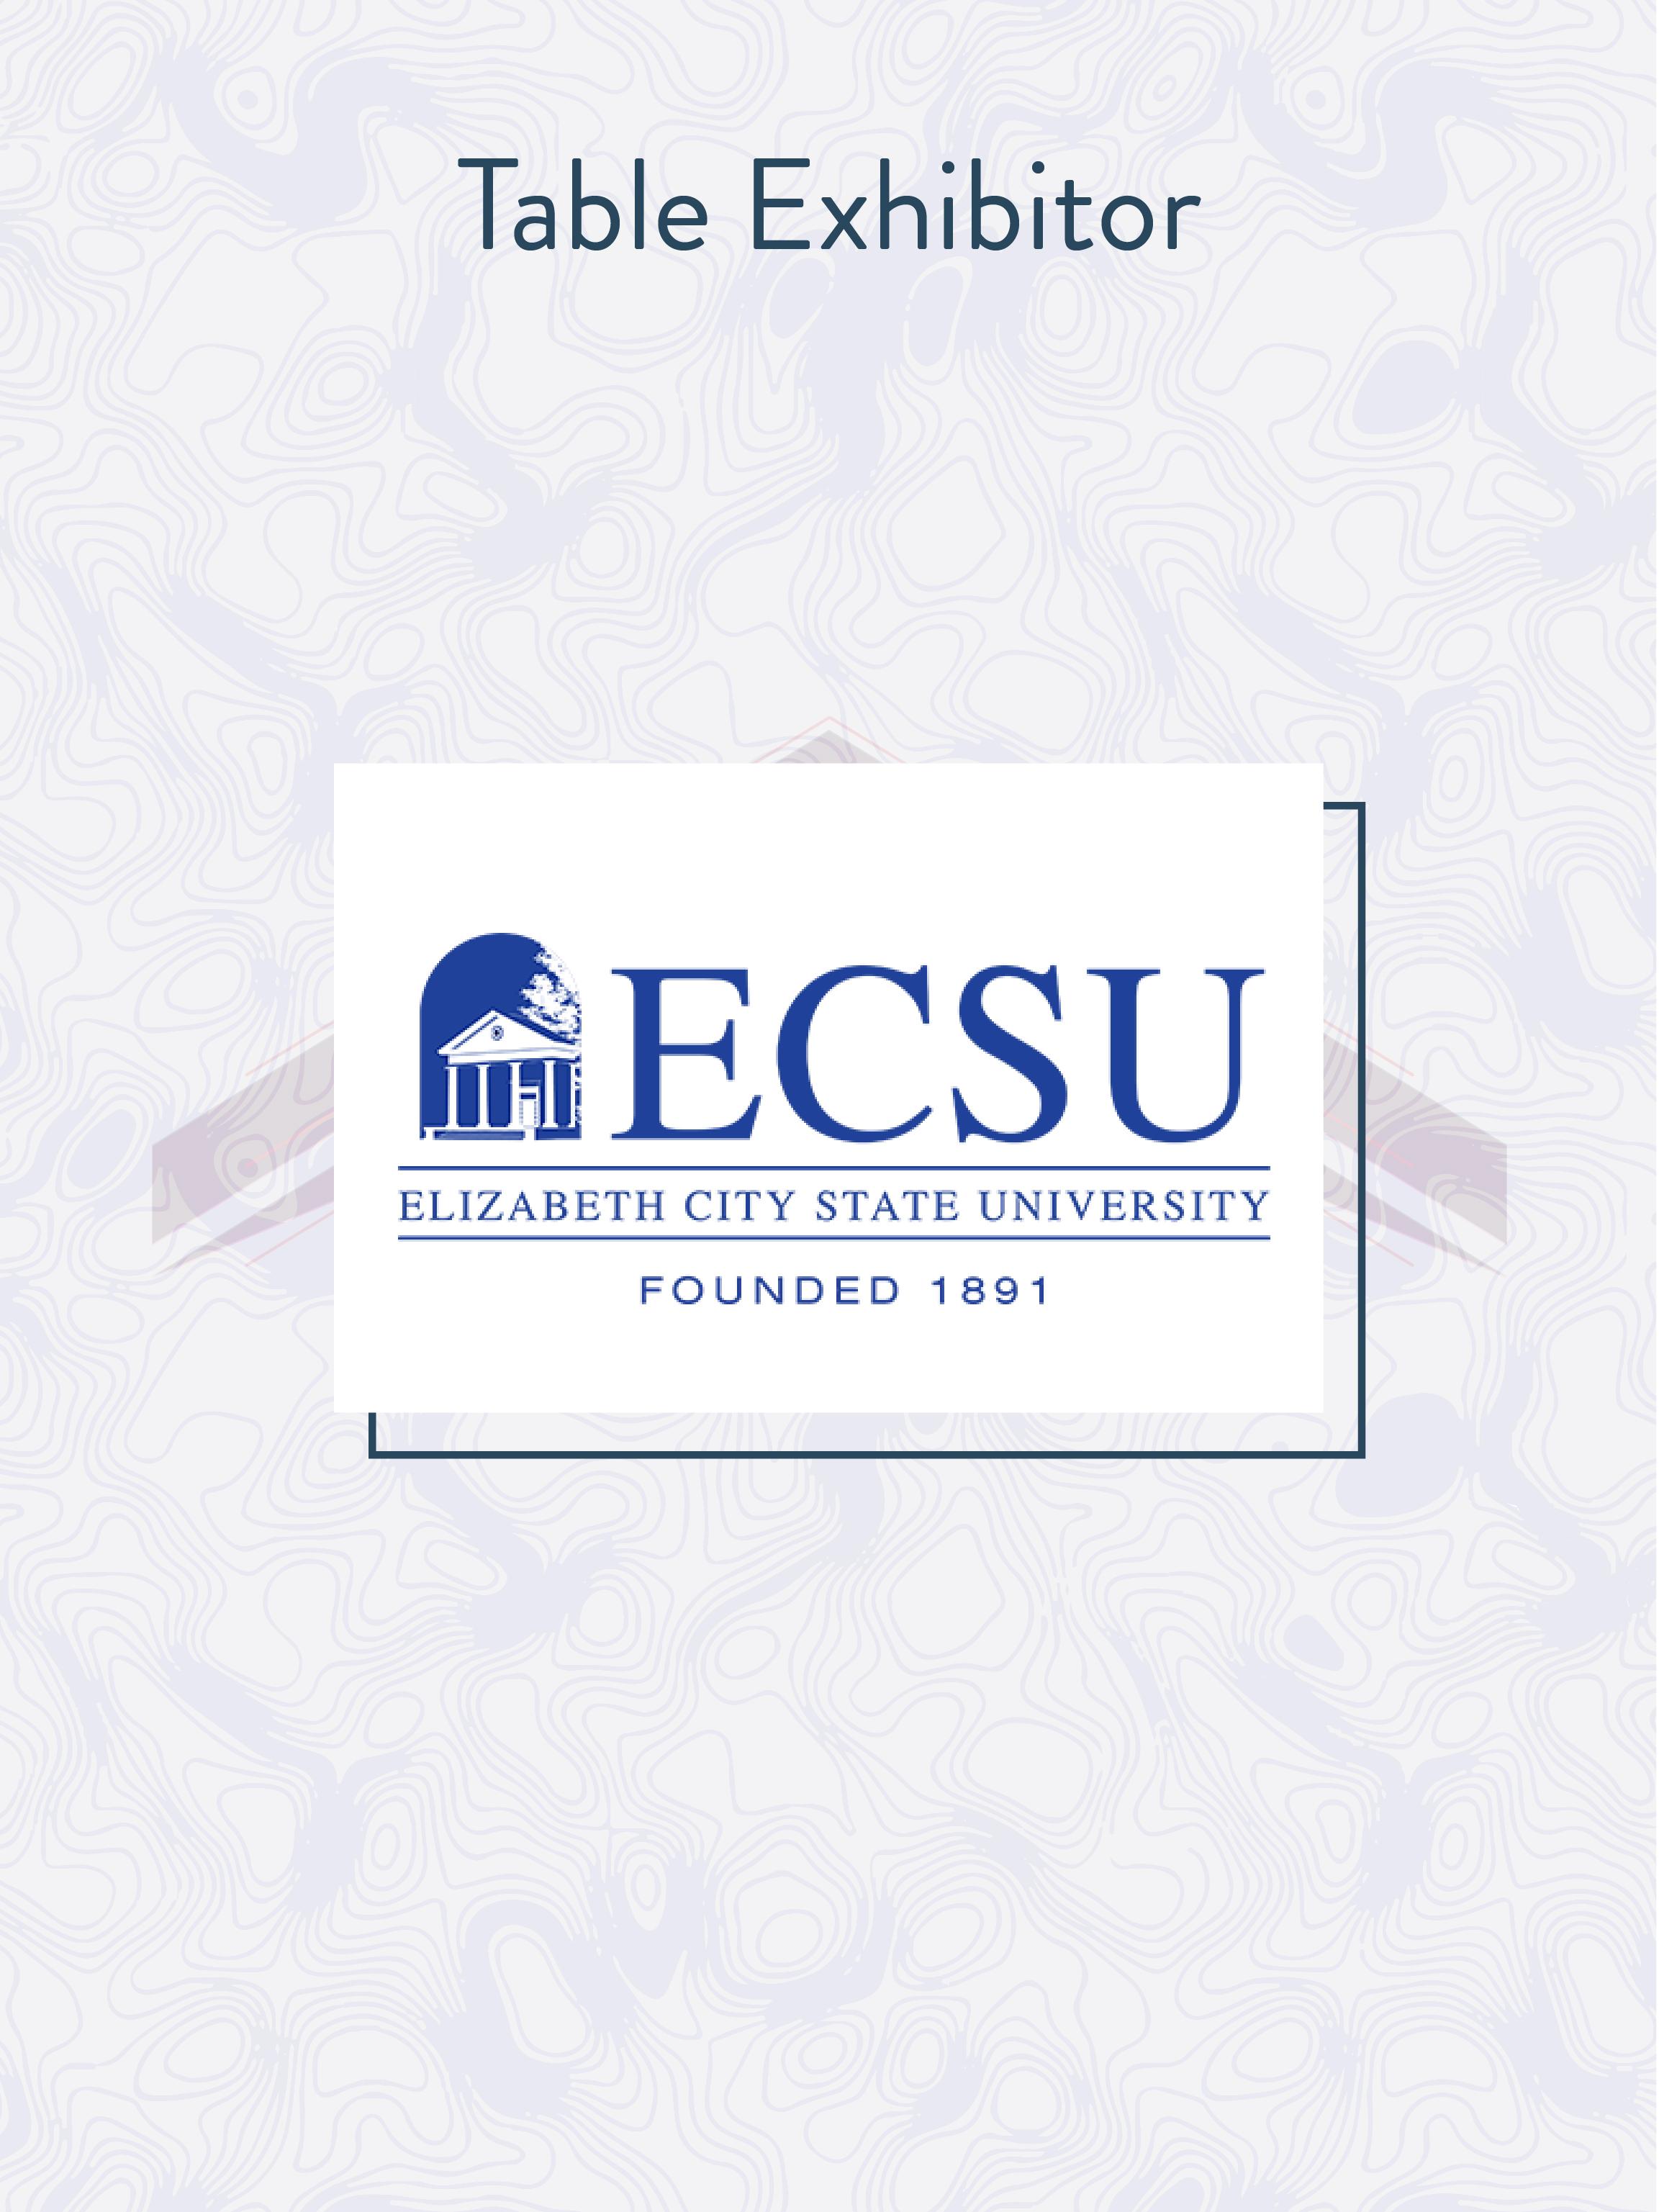 ECSU.jpg